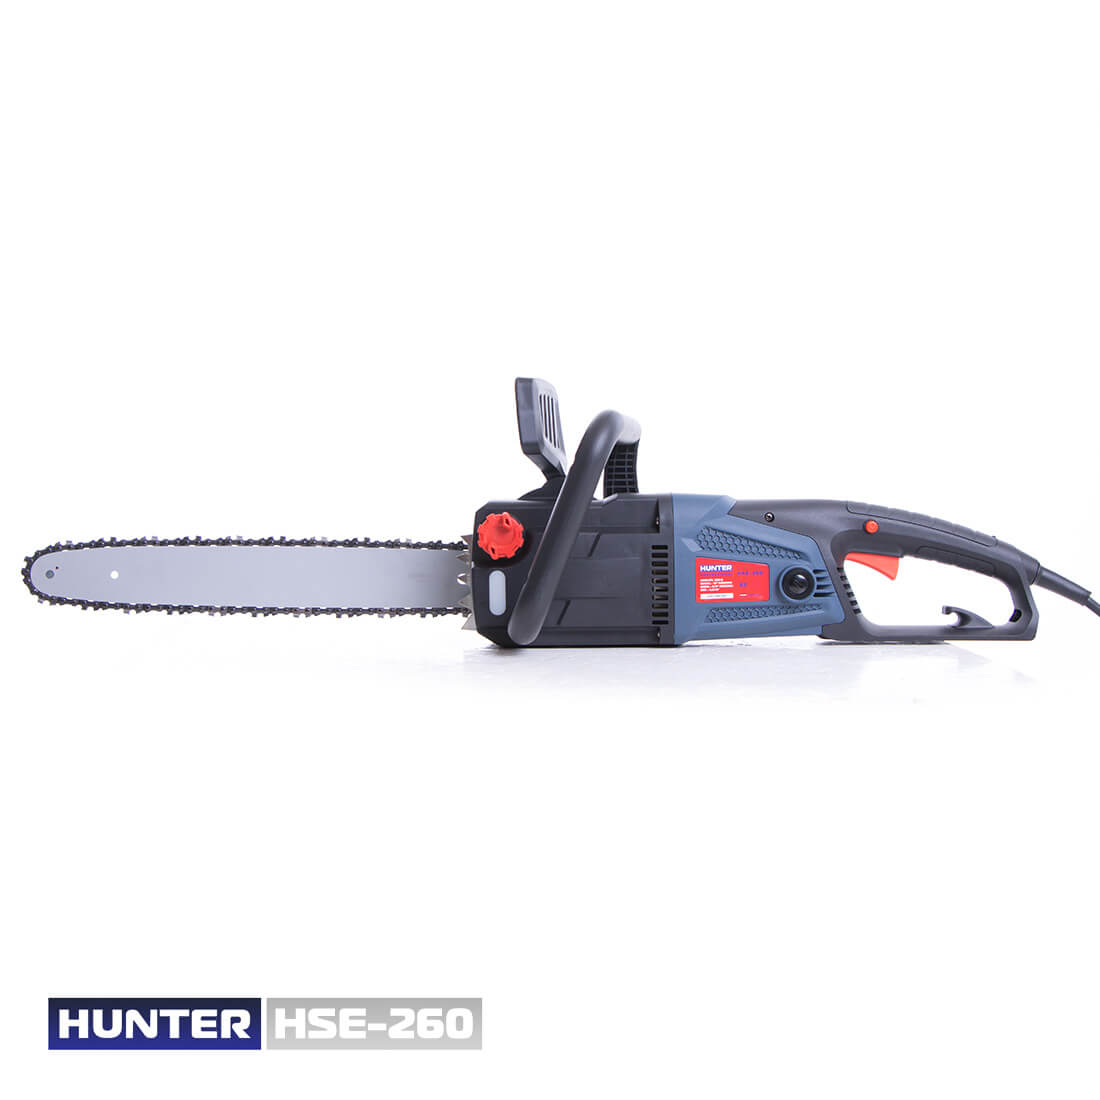 Фото Hunter HSE-280 цена 2700грн №4 — Hunter